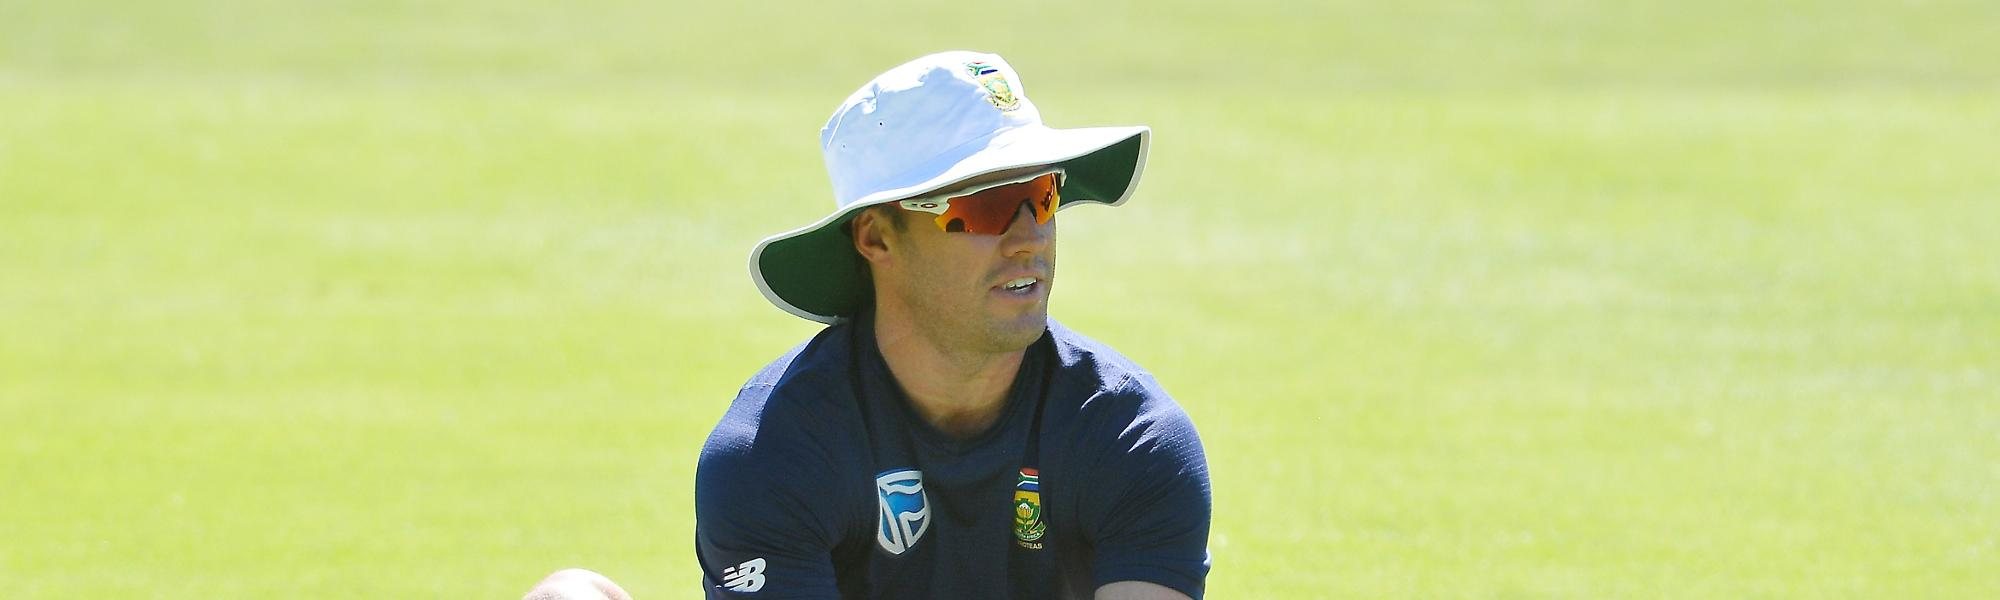 Injured Ab De Villiers Out Of Pakistan Leg Of Psl